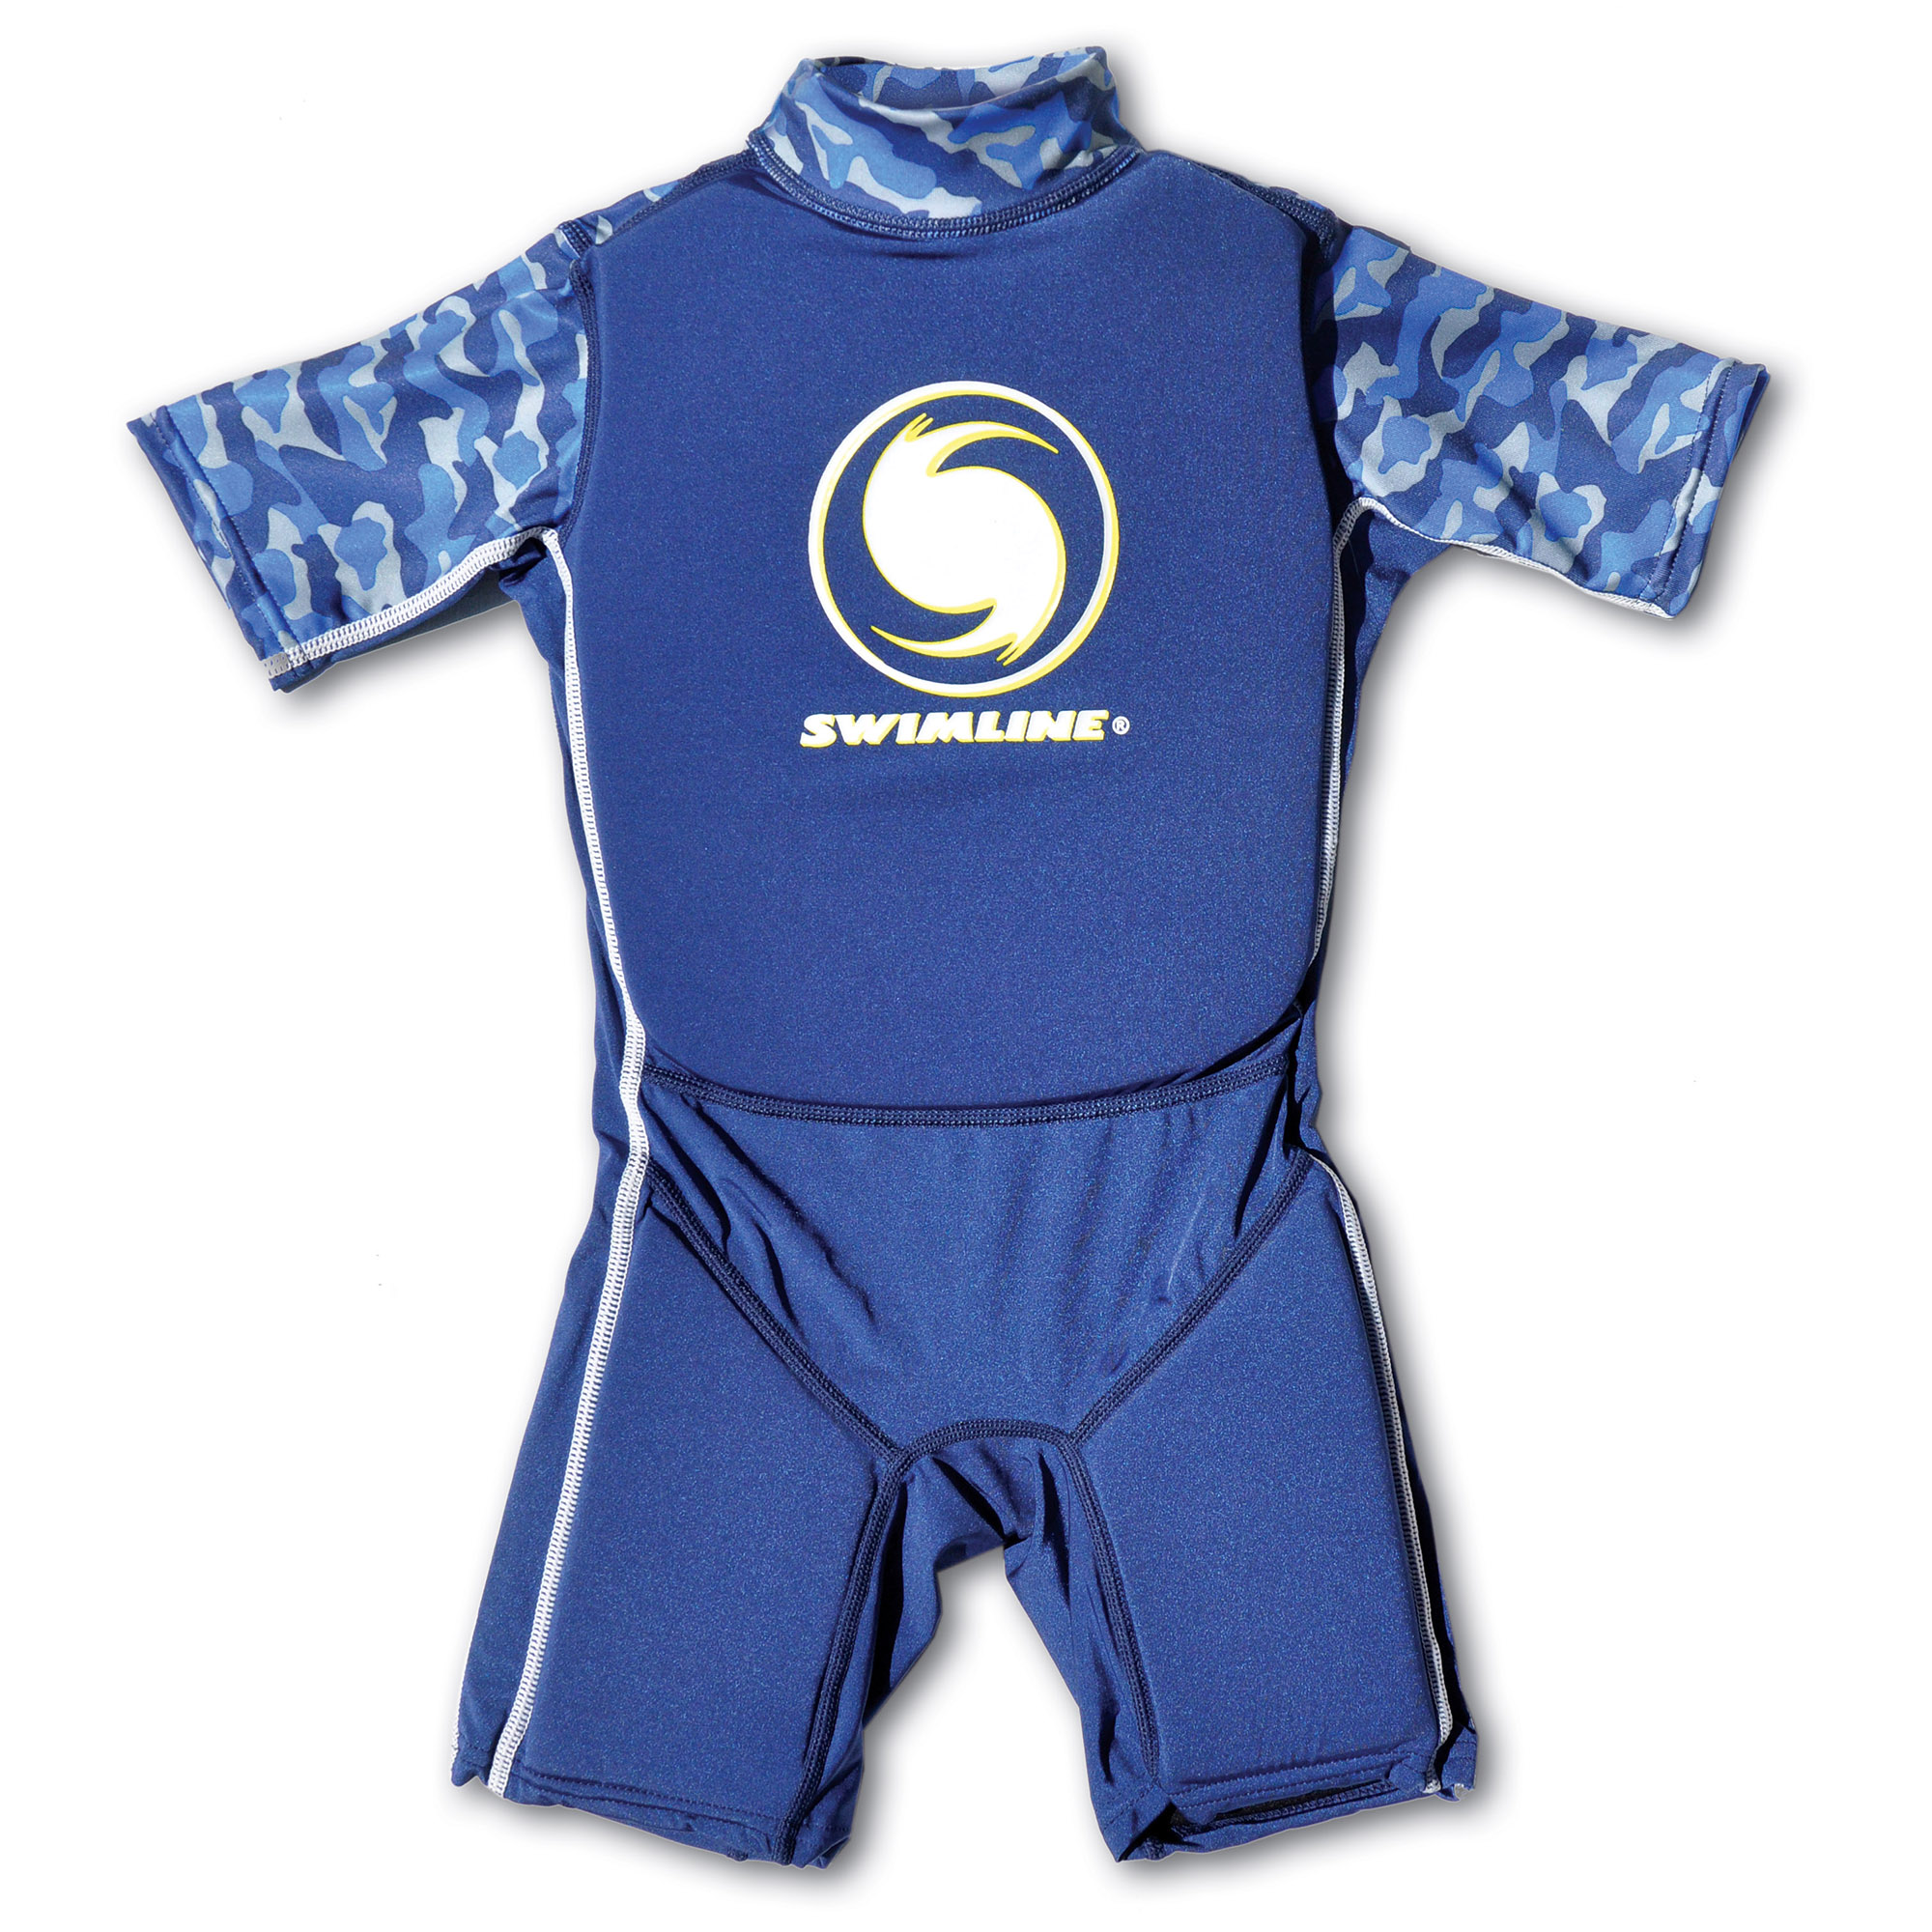 Swimline Blue Lycra Boy's Floating Swim Trainer Wet Suit Life Vest Small 9892B